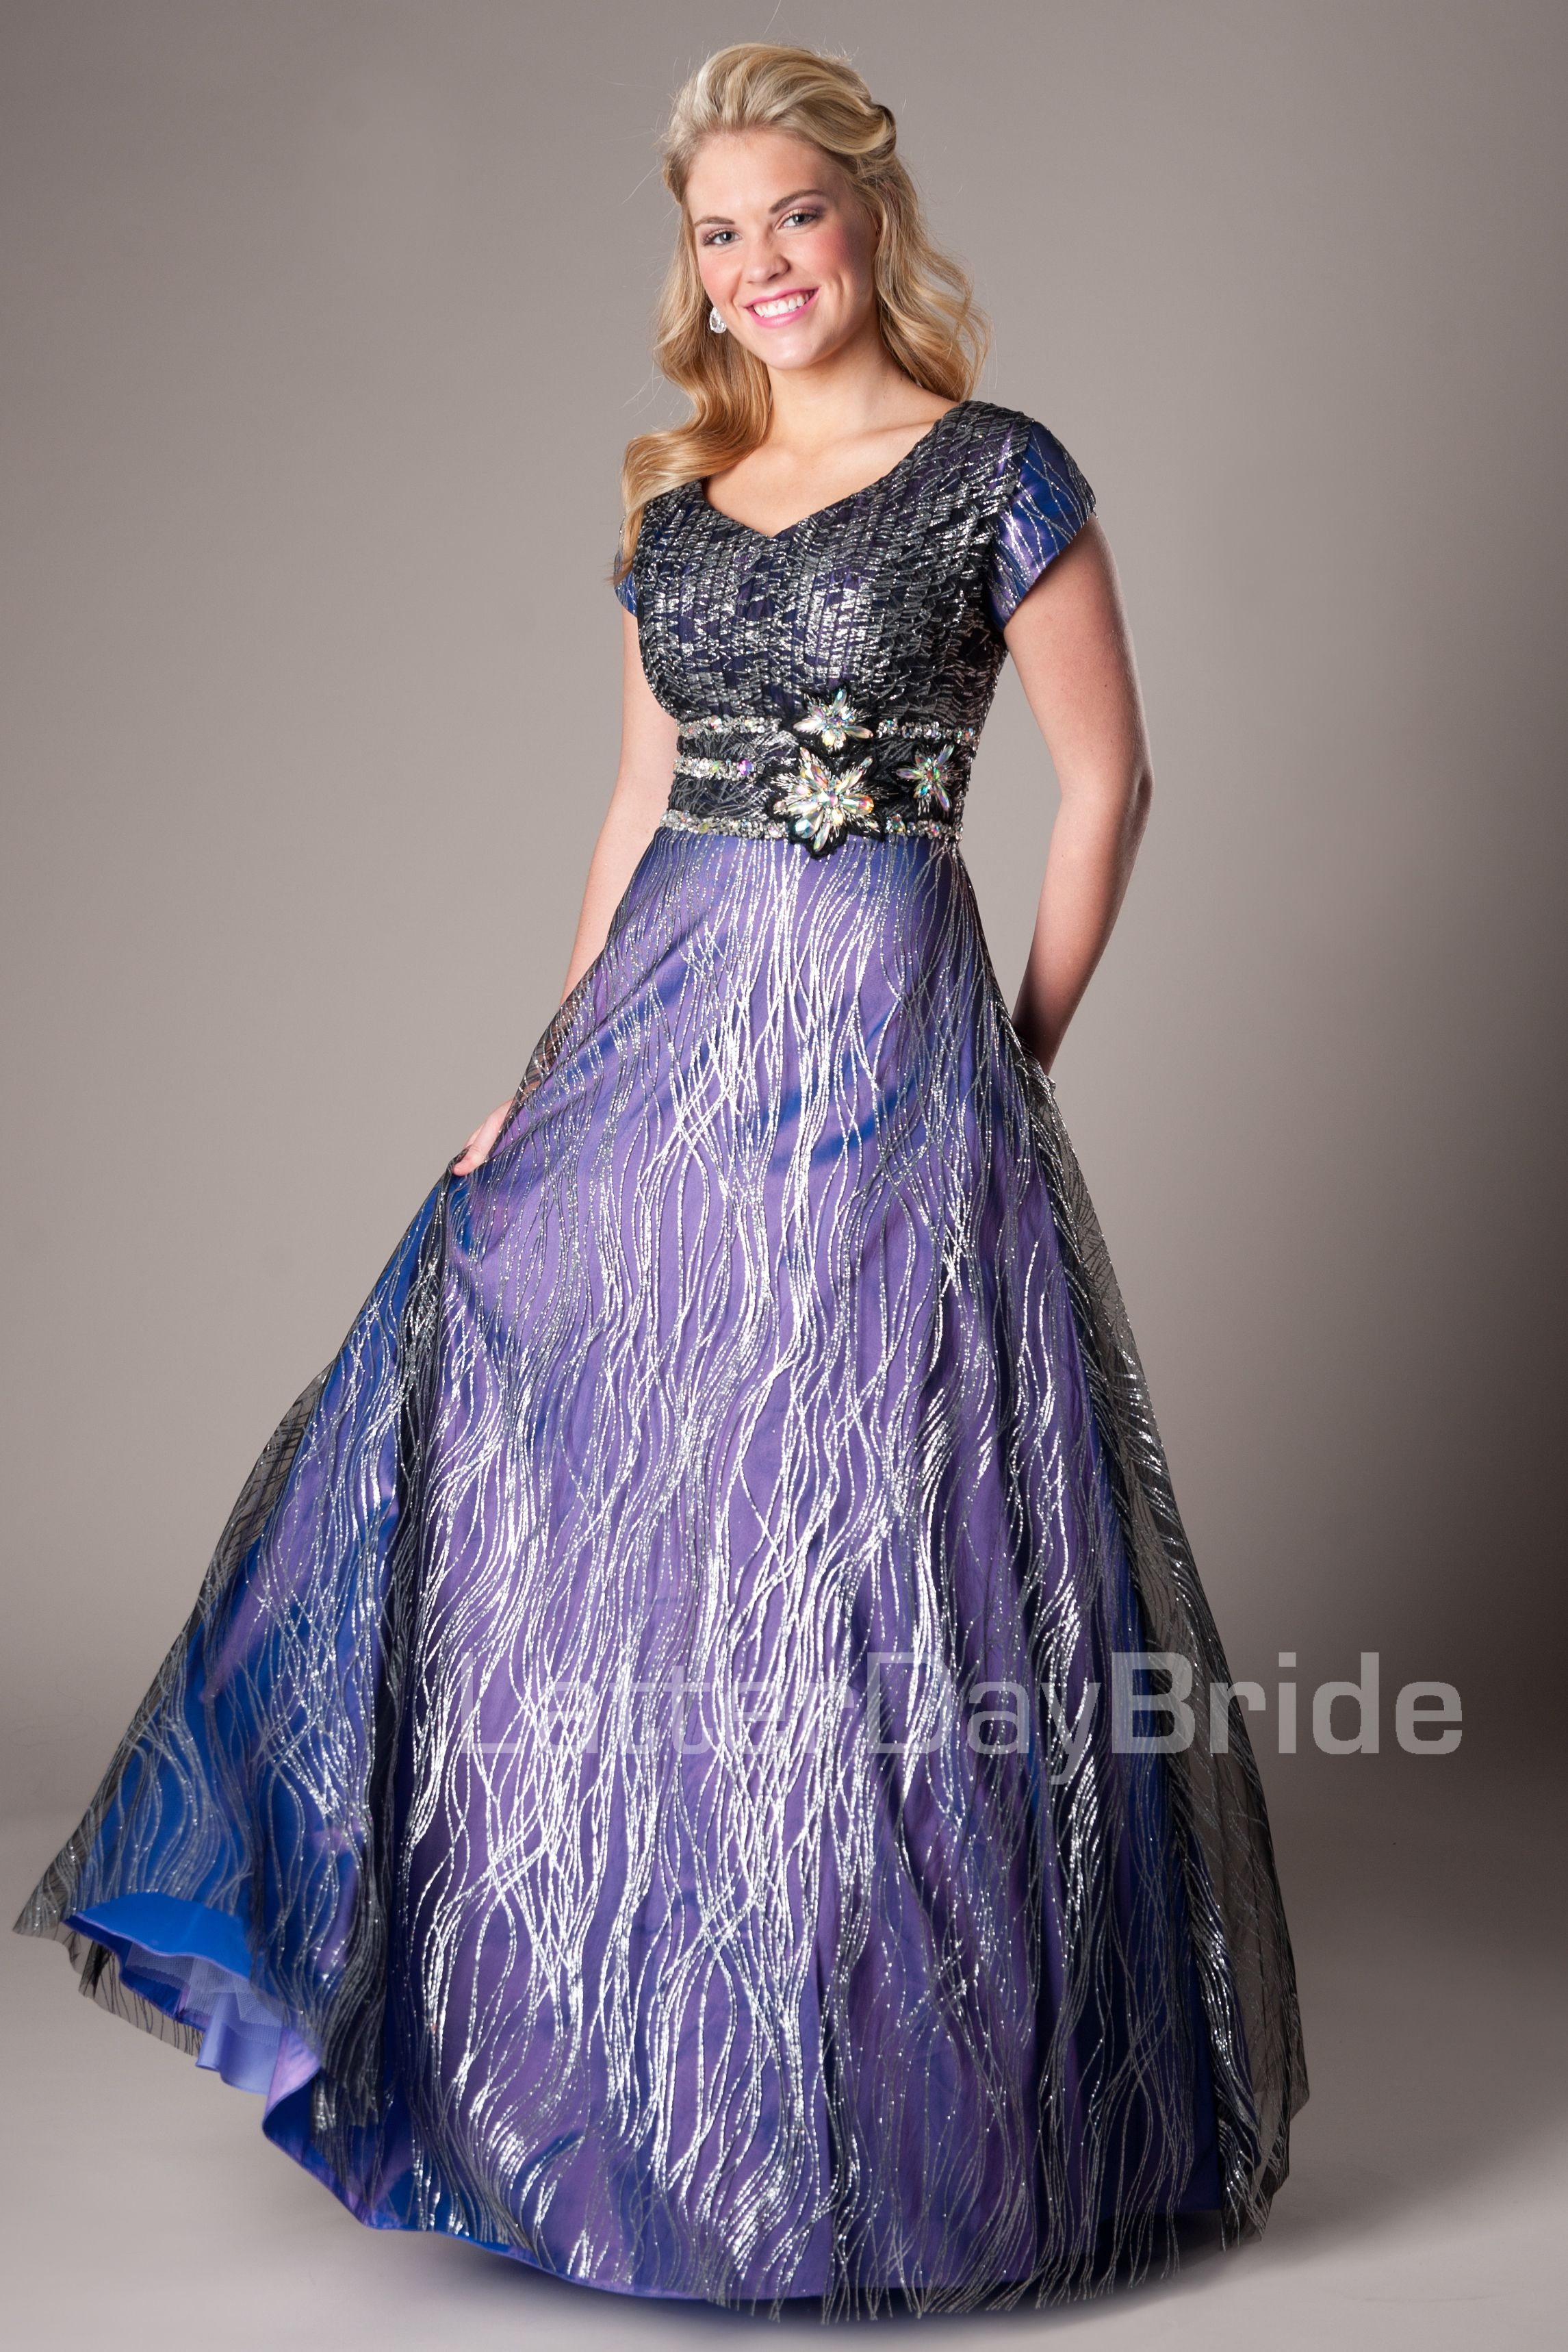 Modest Prom Dresses Prom Dresses Modest Modest Dresses Prom Dresses [ 3436 x 2291 Pixel ]